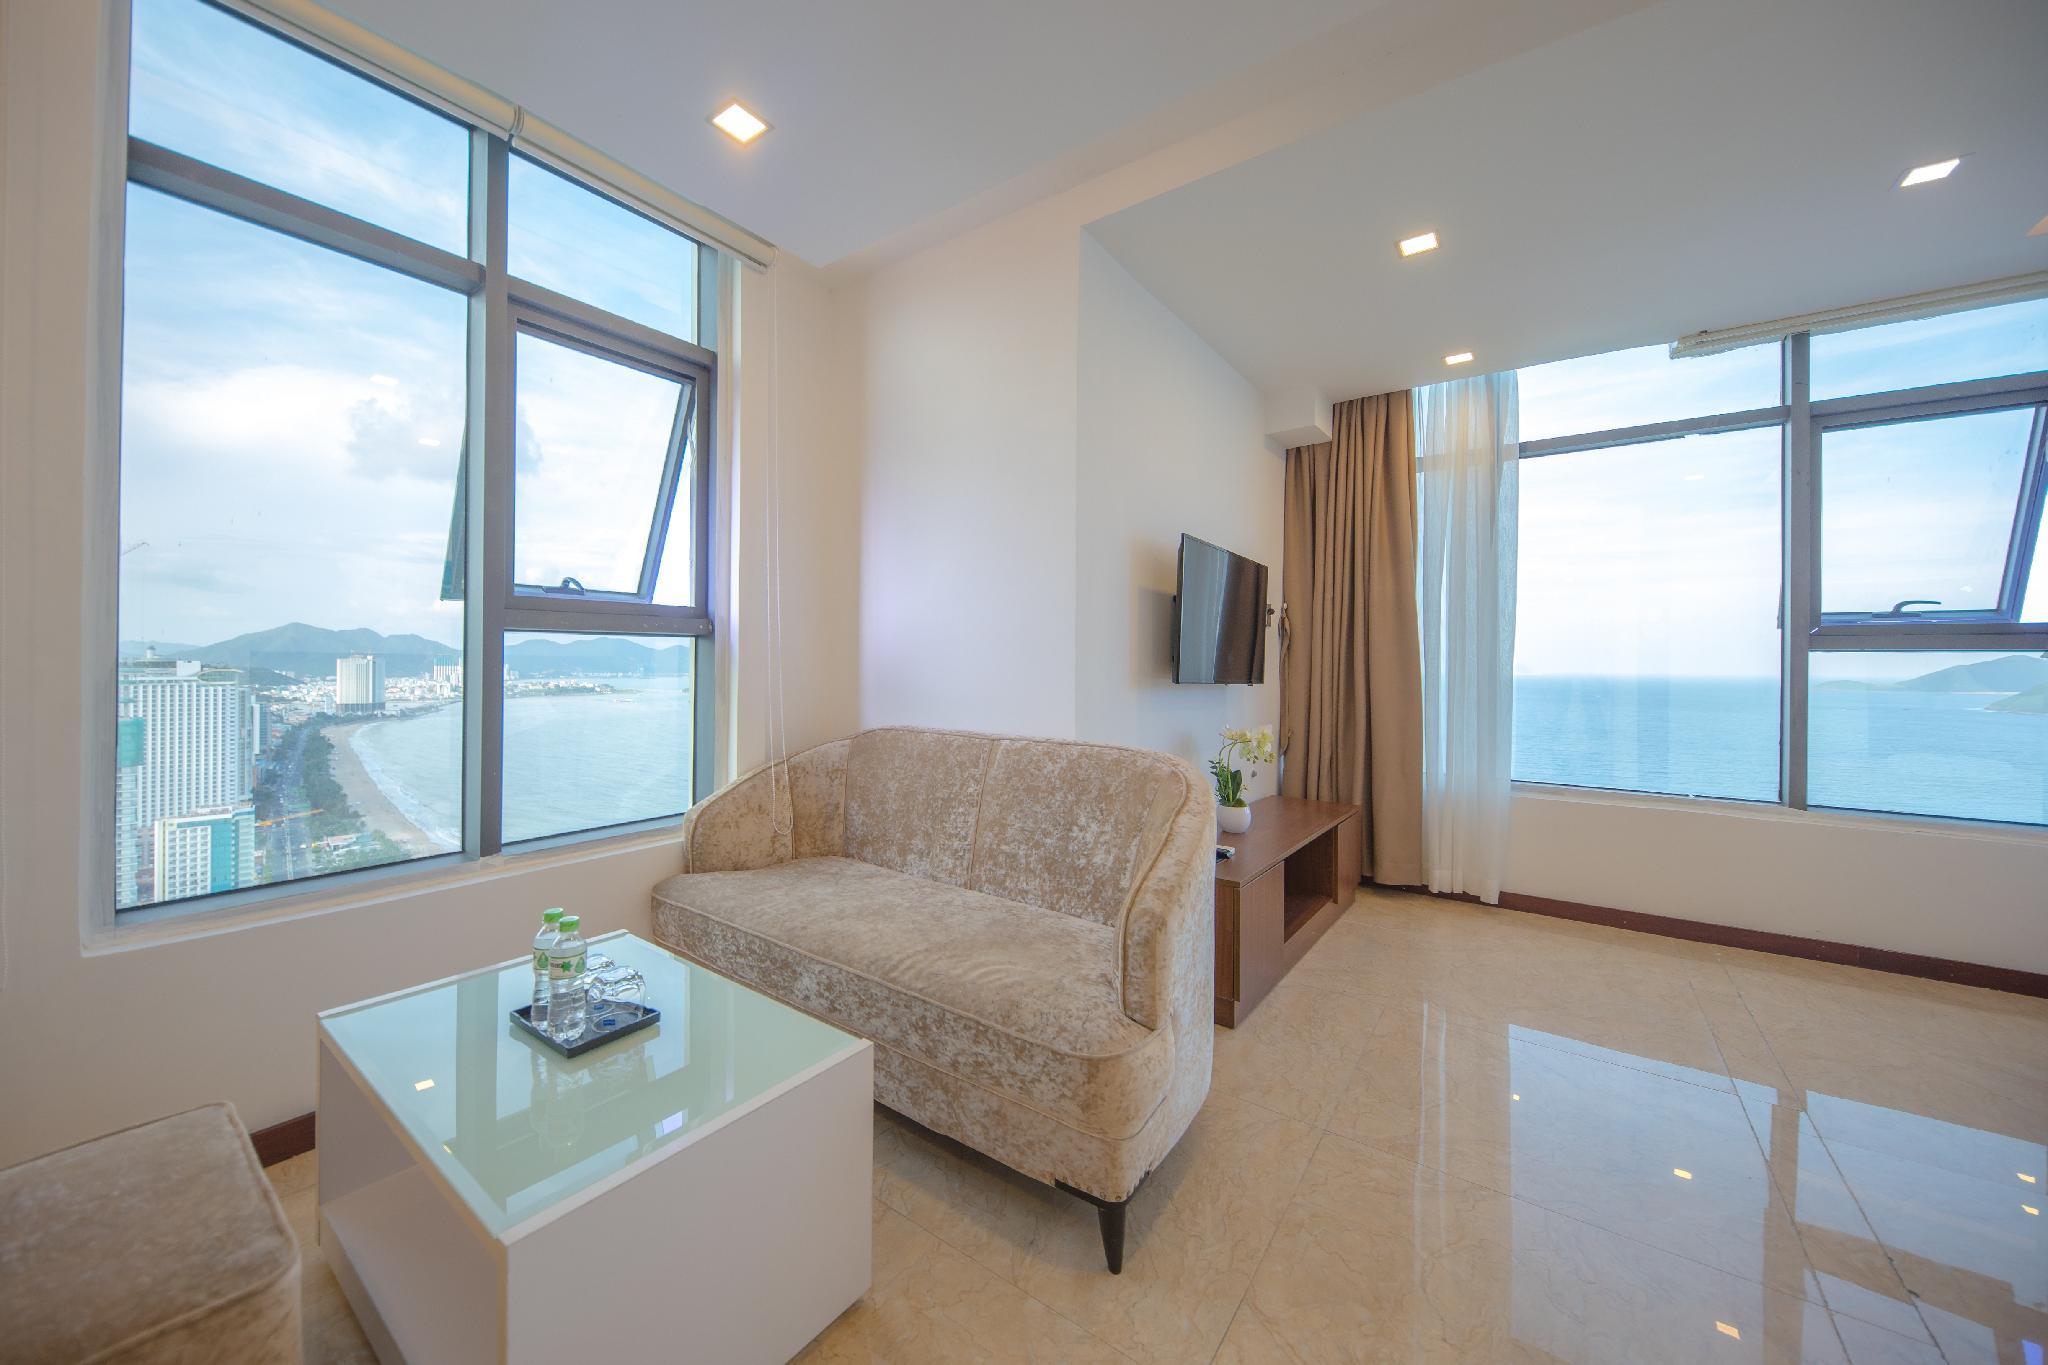 The SUN Expansive Sea View Grand Studio By Beach